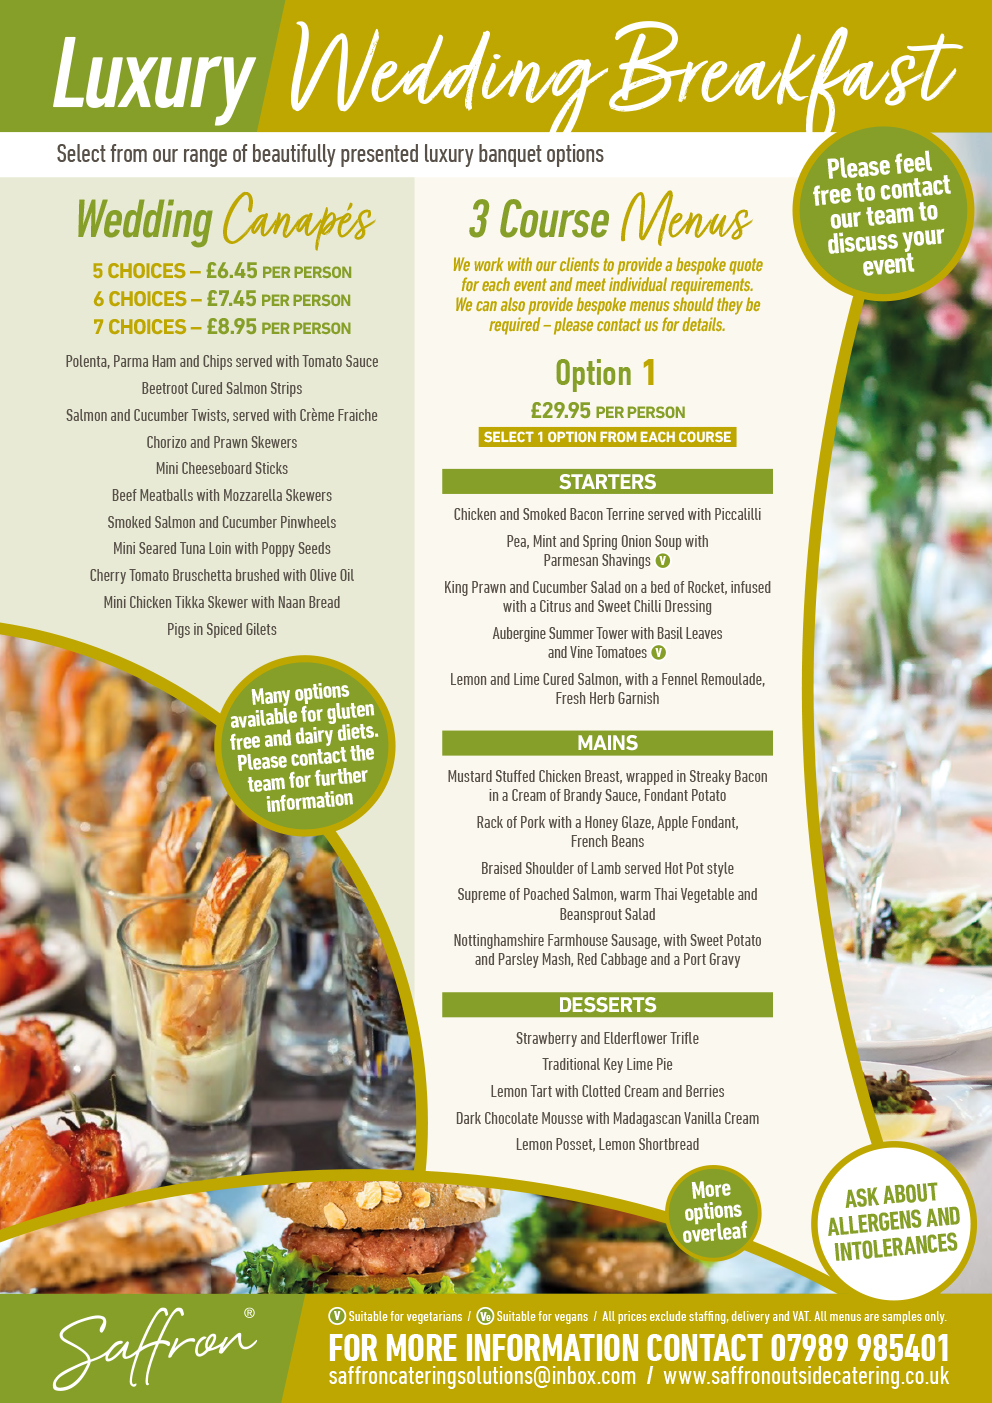 Saffron Menu Wedding Breakfast 1 - Wedding Breakfast Menu